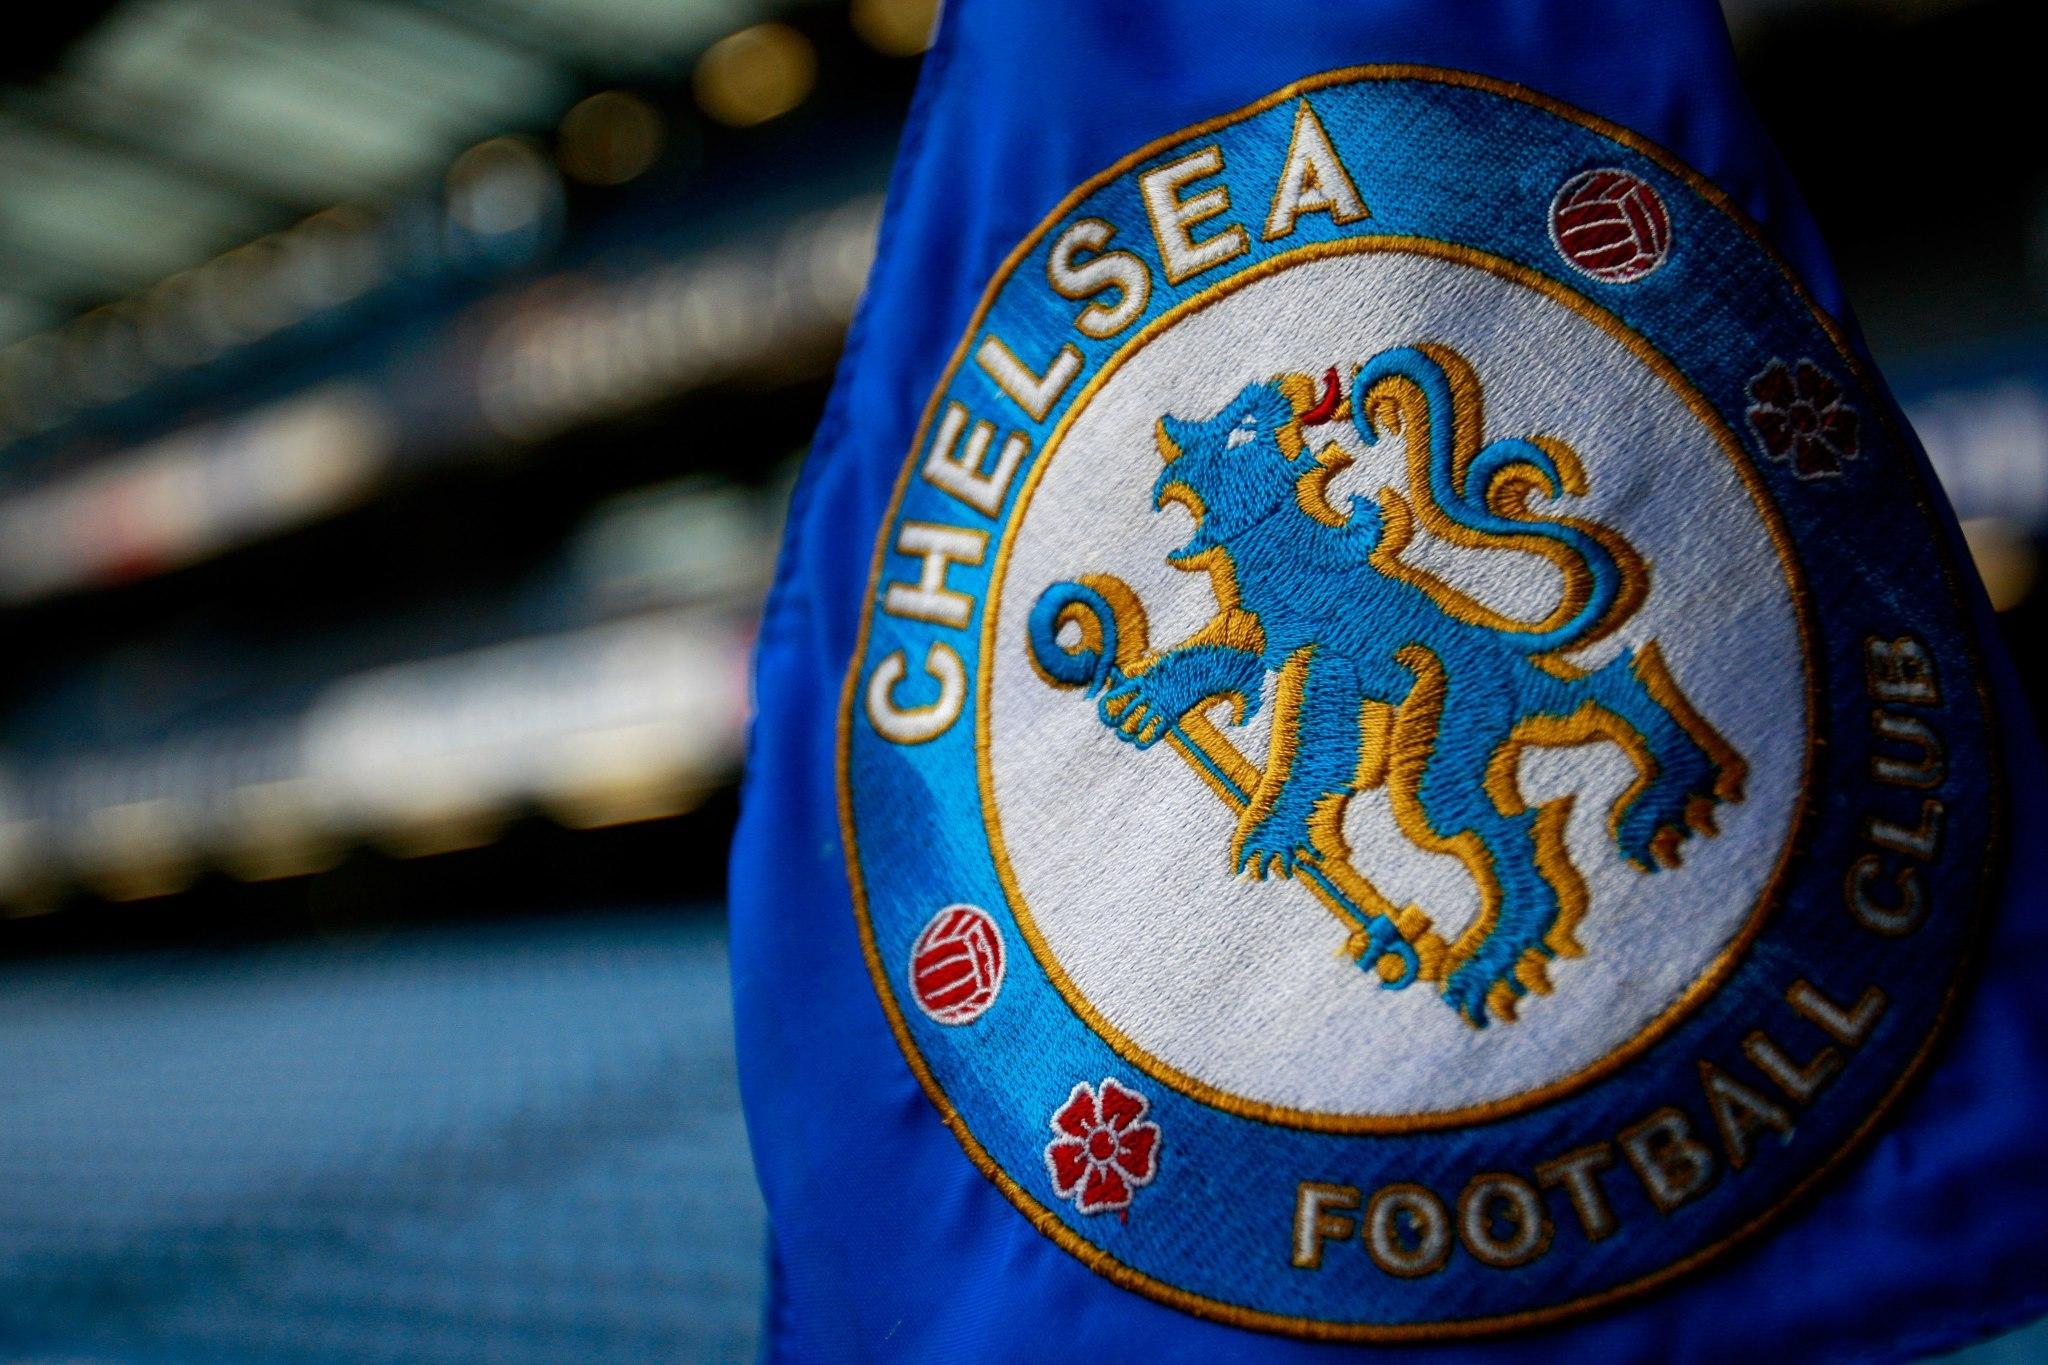 Chelsea FC Blues logo soccer football flags wallpaper | 2048x1365 ...